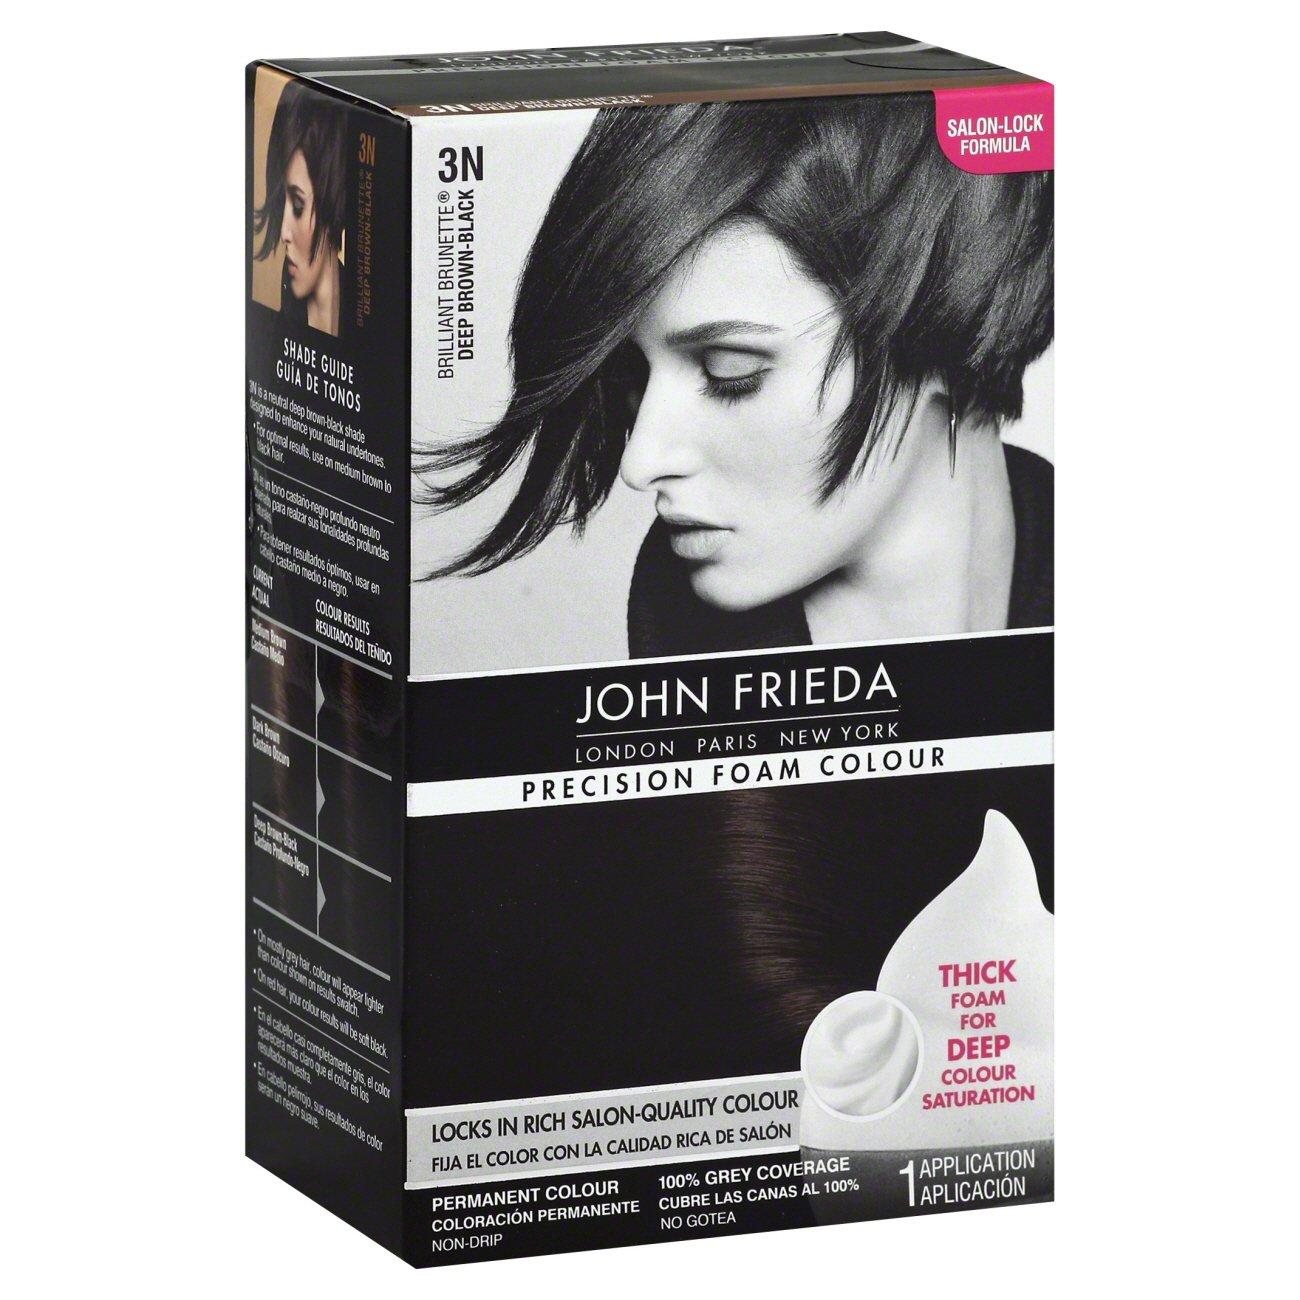 John Frieda Precision Foam Colour Deep Brown Black Permanent Colour